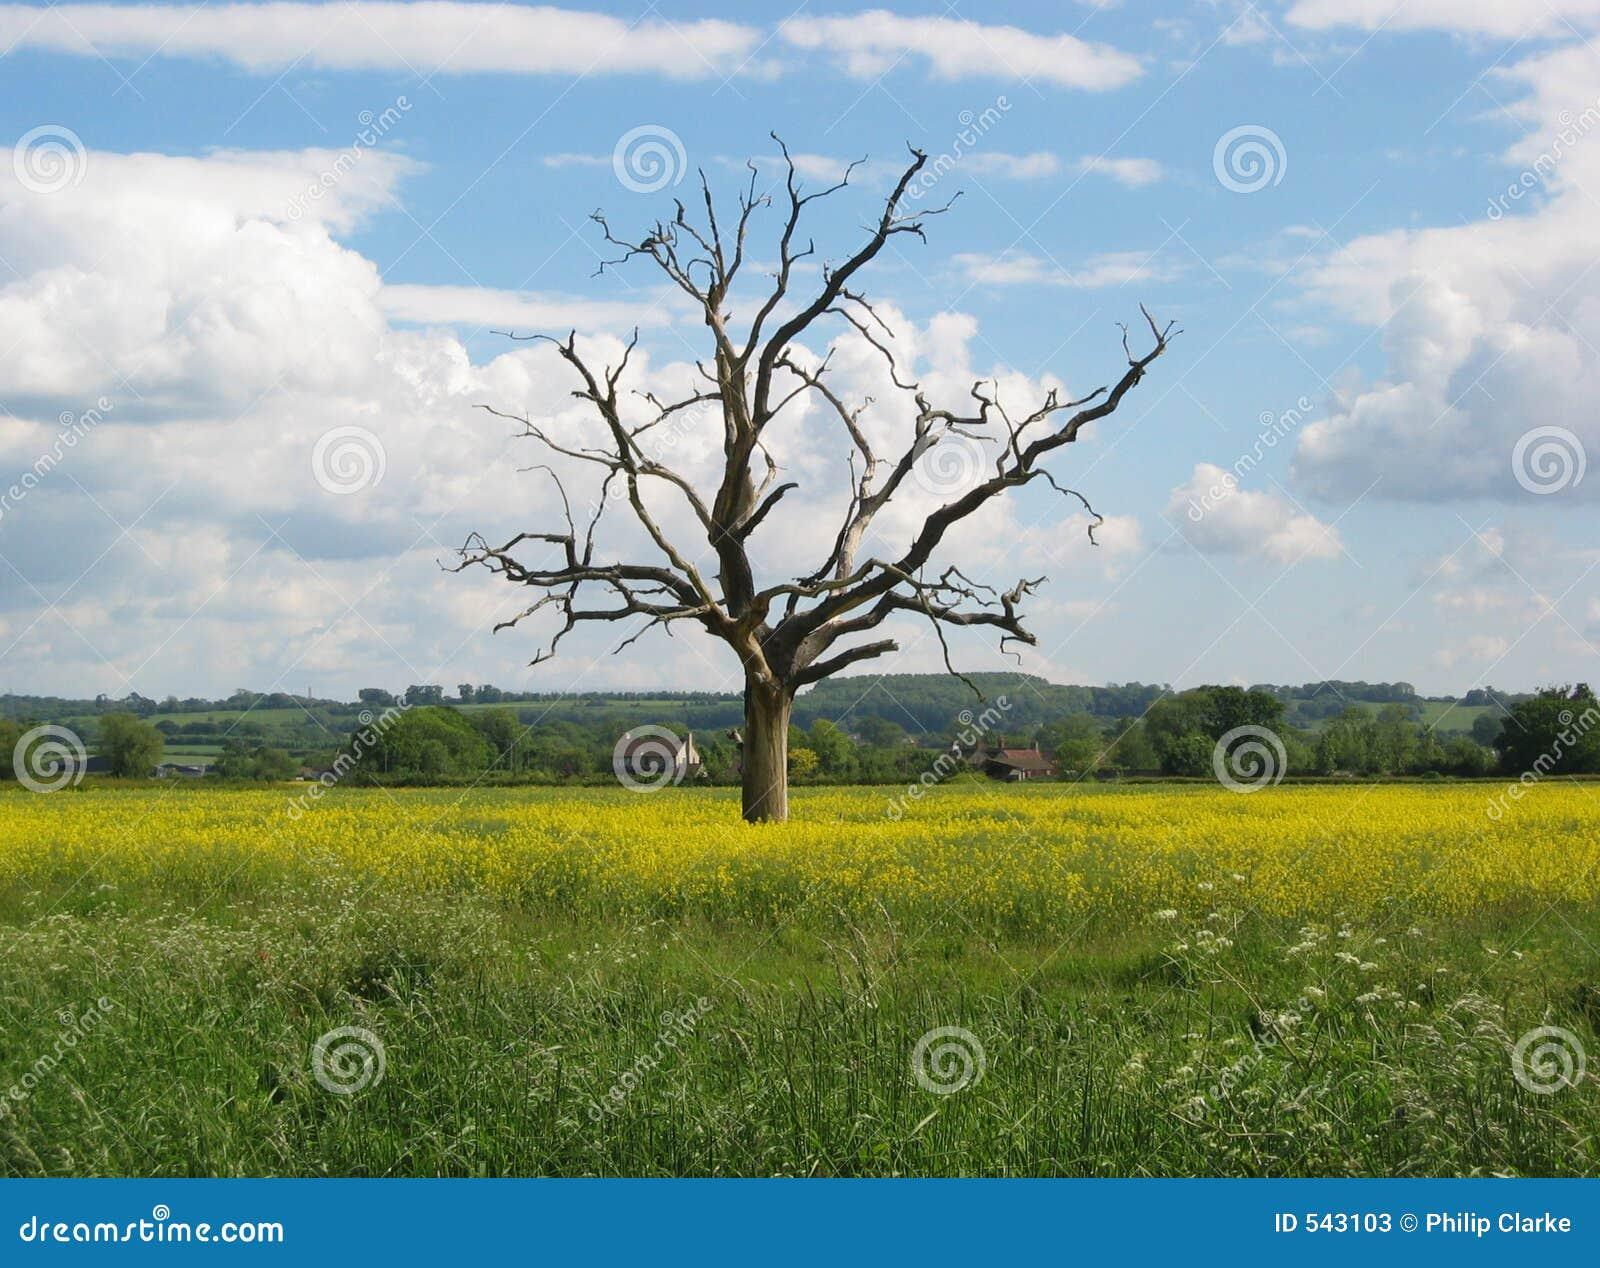 Download 孤立结构树 库存图片. 图片 包括有 横向, 夏天, 结构树, 草甸, 天空, 云彩, 毛茛 - 543103